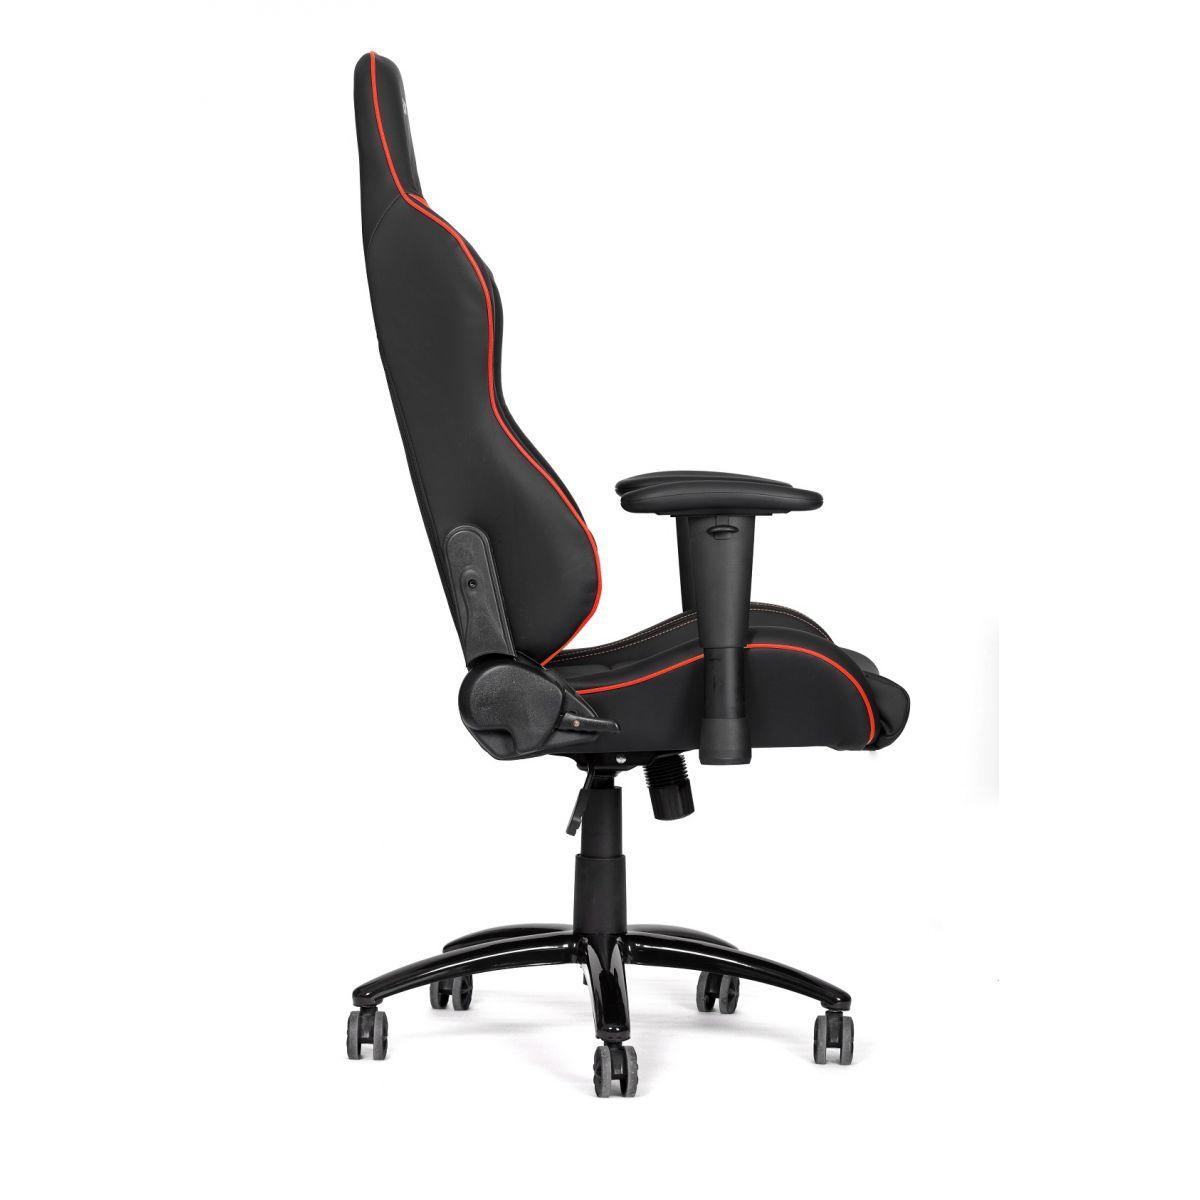 Cadeira AKRacing Octane Gaming Red AK-OCTANE-RD - AKRacing